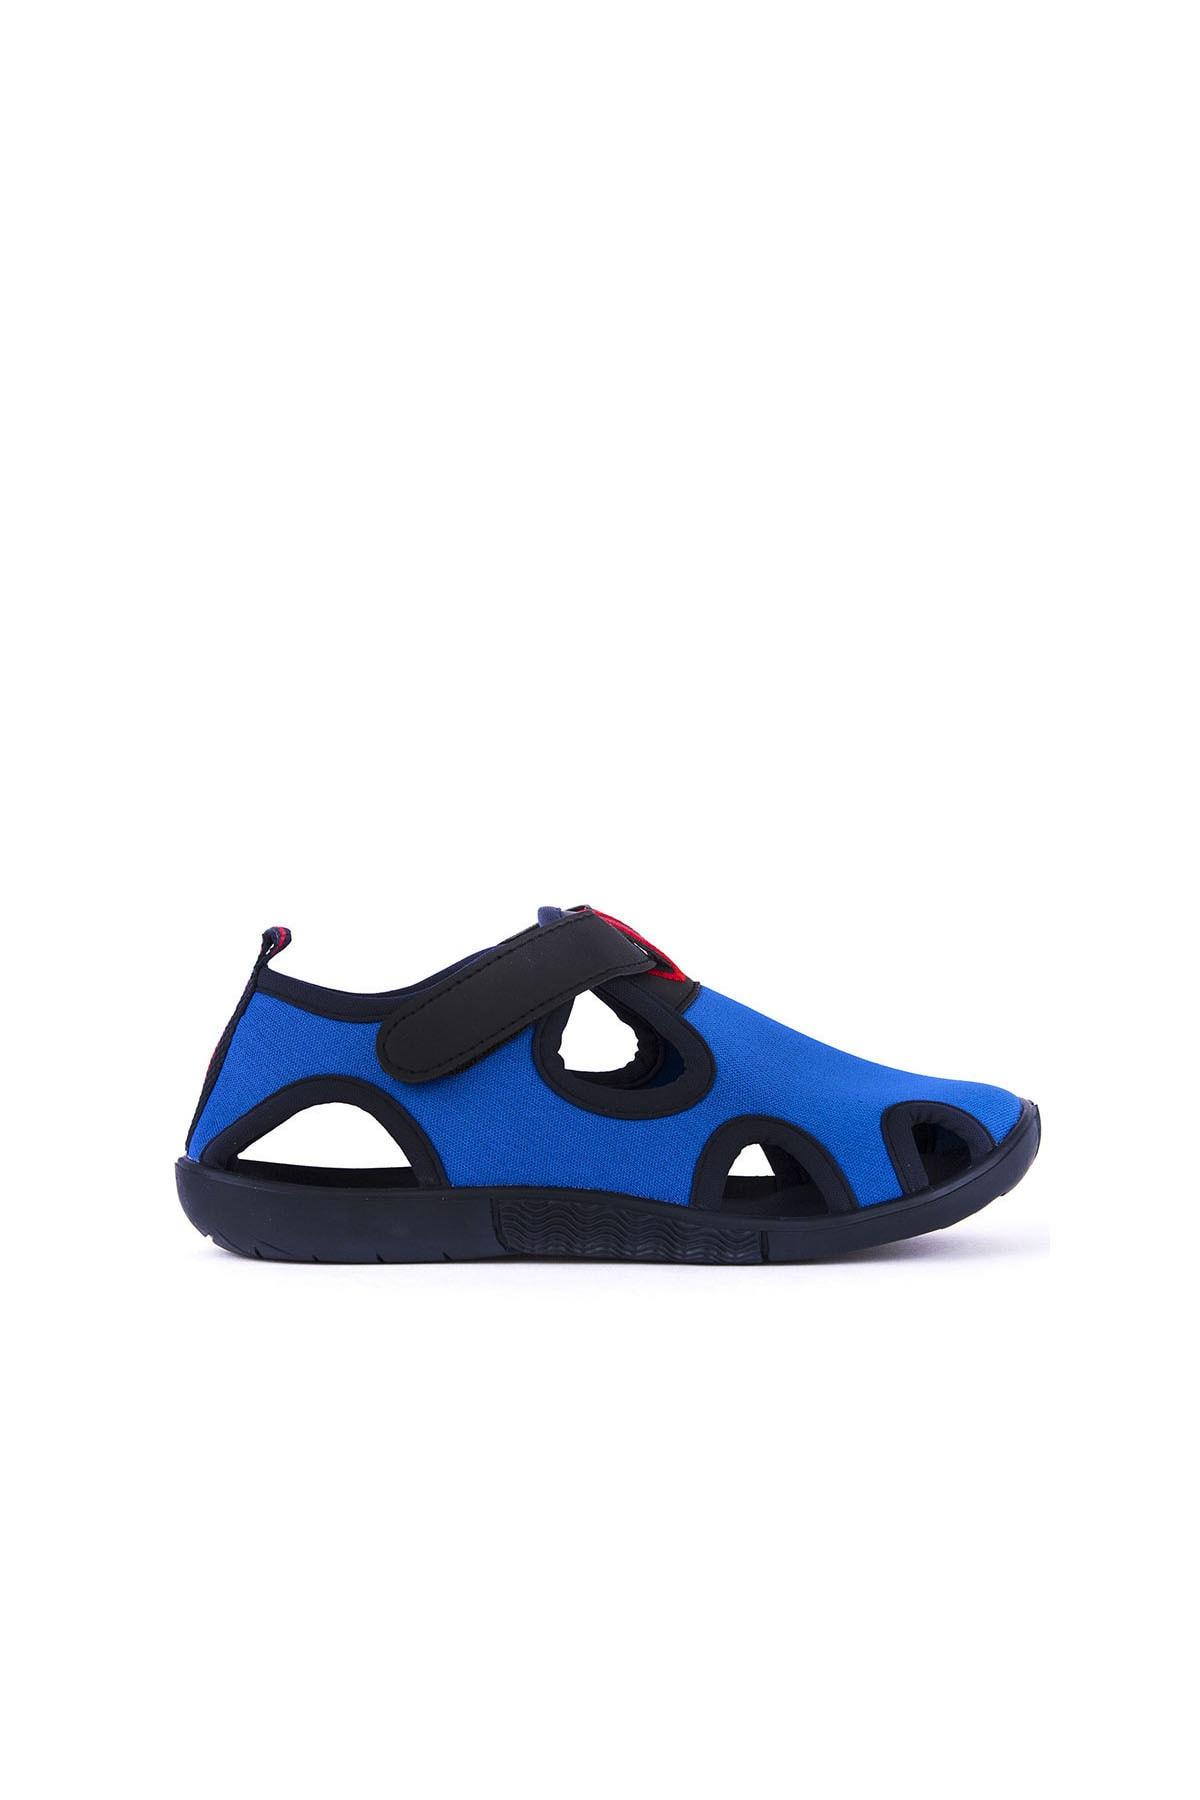 Slazenger UNNI Çocuk Sandalet Saks Mavi SA10LF054 1